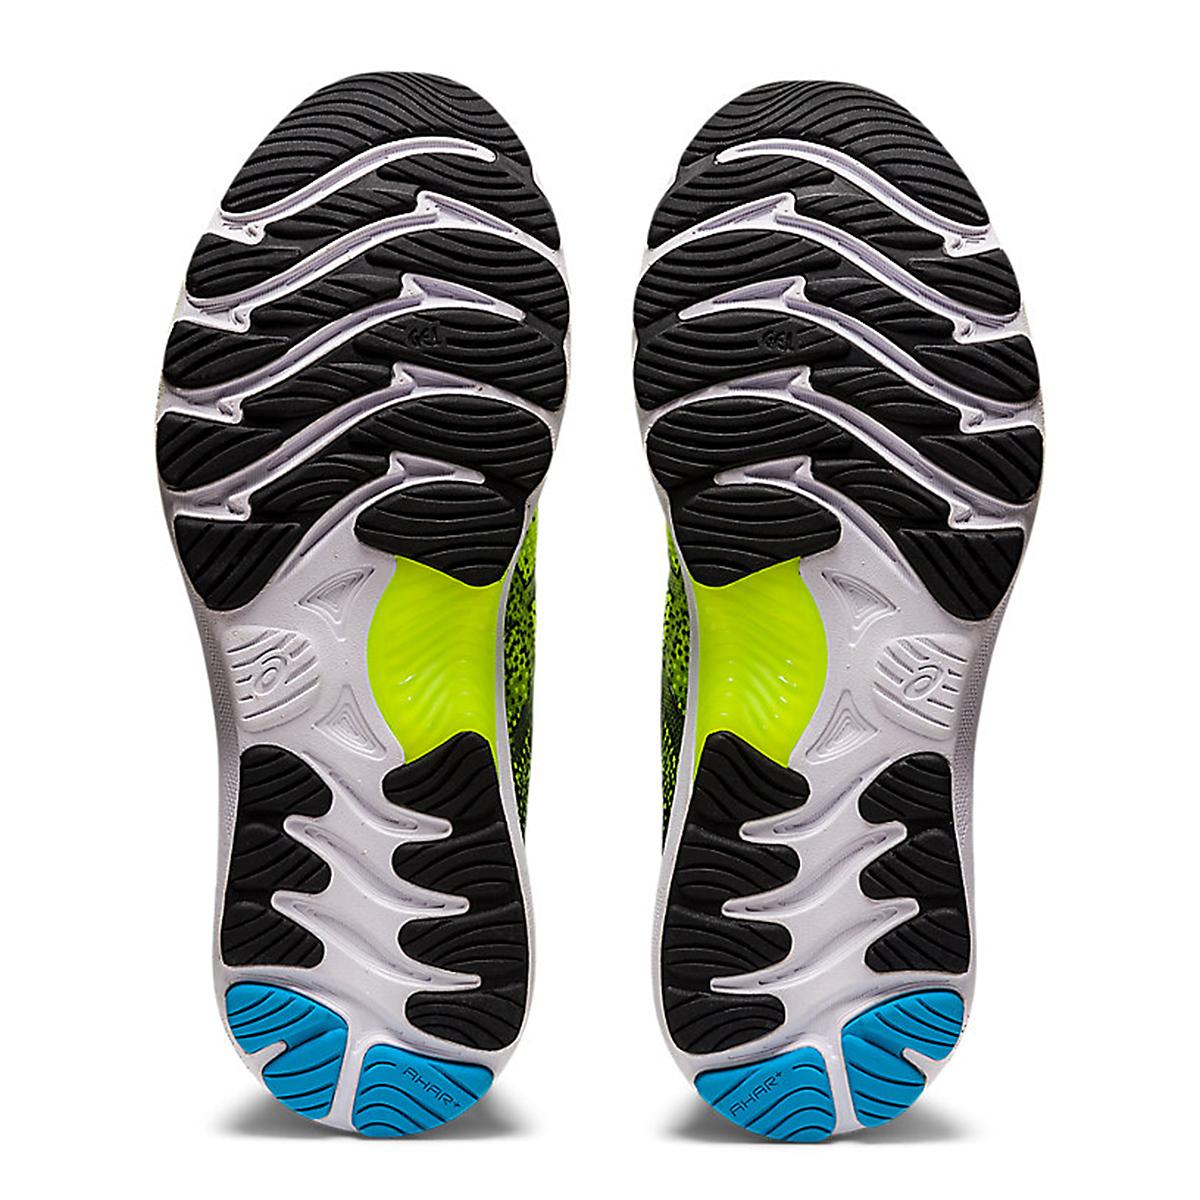 Men's Asics Gel-Nimbus 23 Running Shoe - Color: Hazard Green/Black - Size: 7 - Width: Regular, Hazard Green/Black, large, image 3